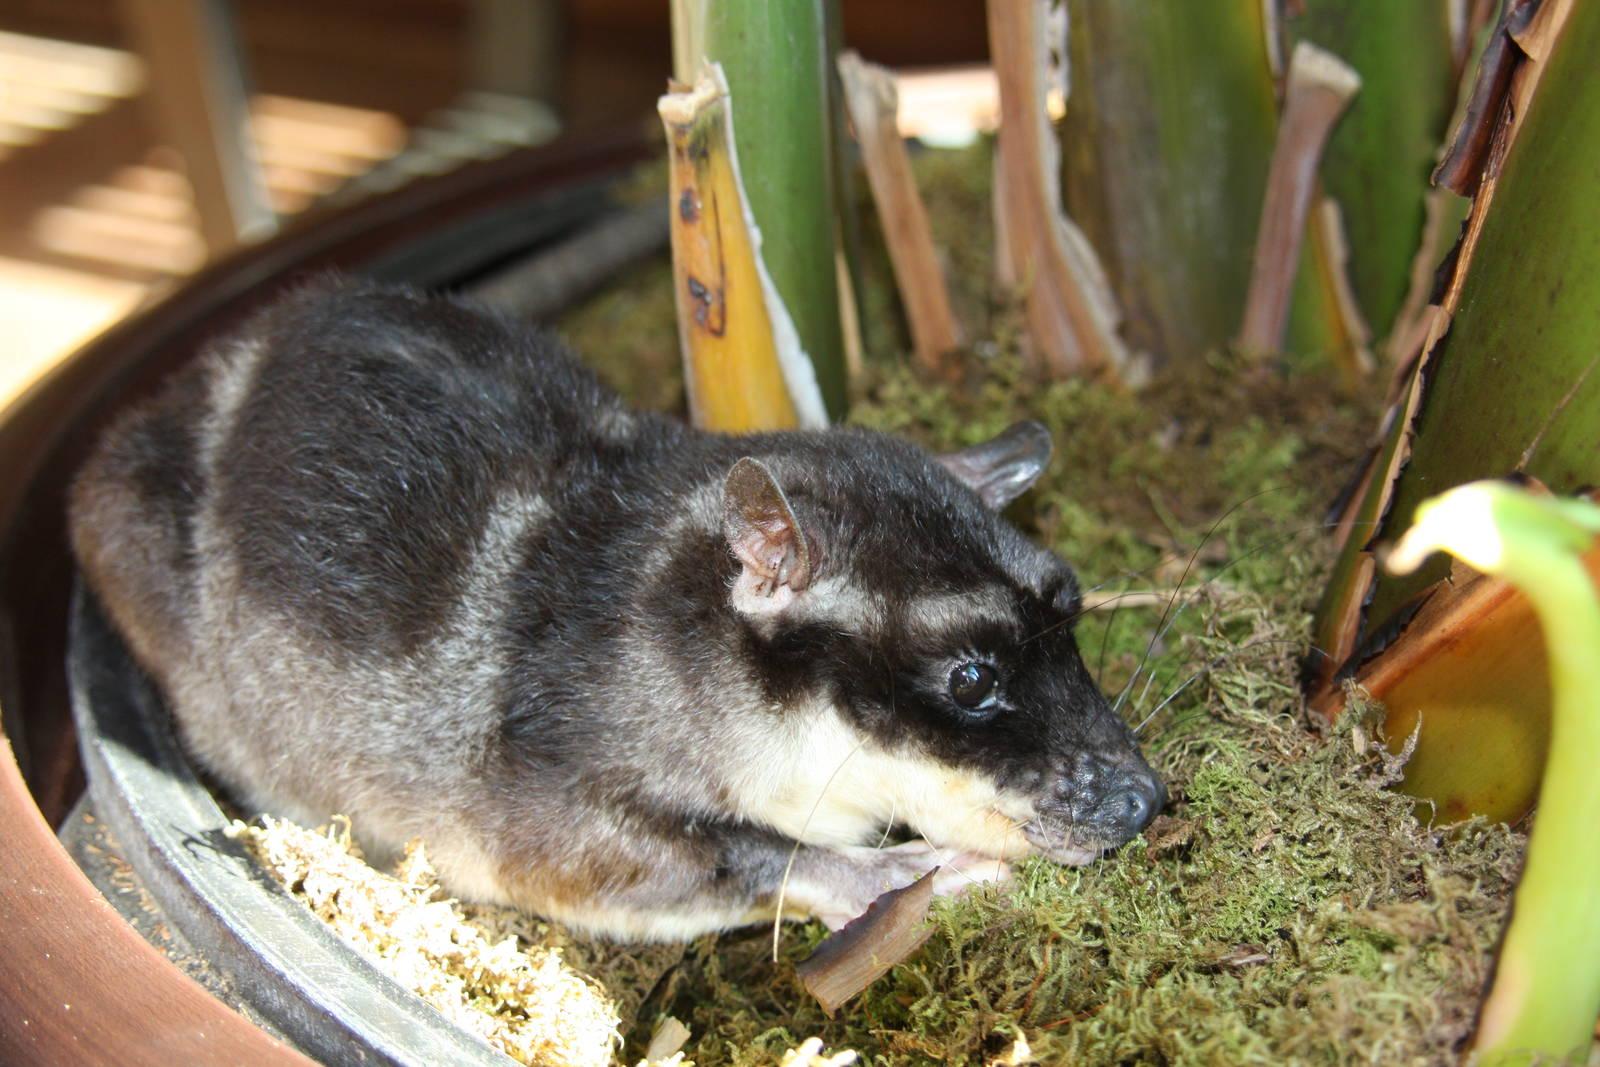 Chironectes minimus, Foto: zoochat.com